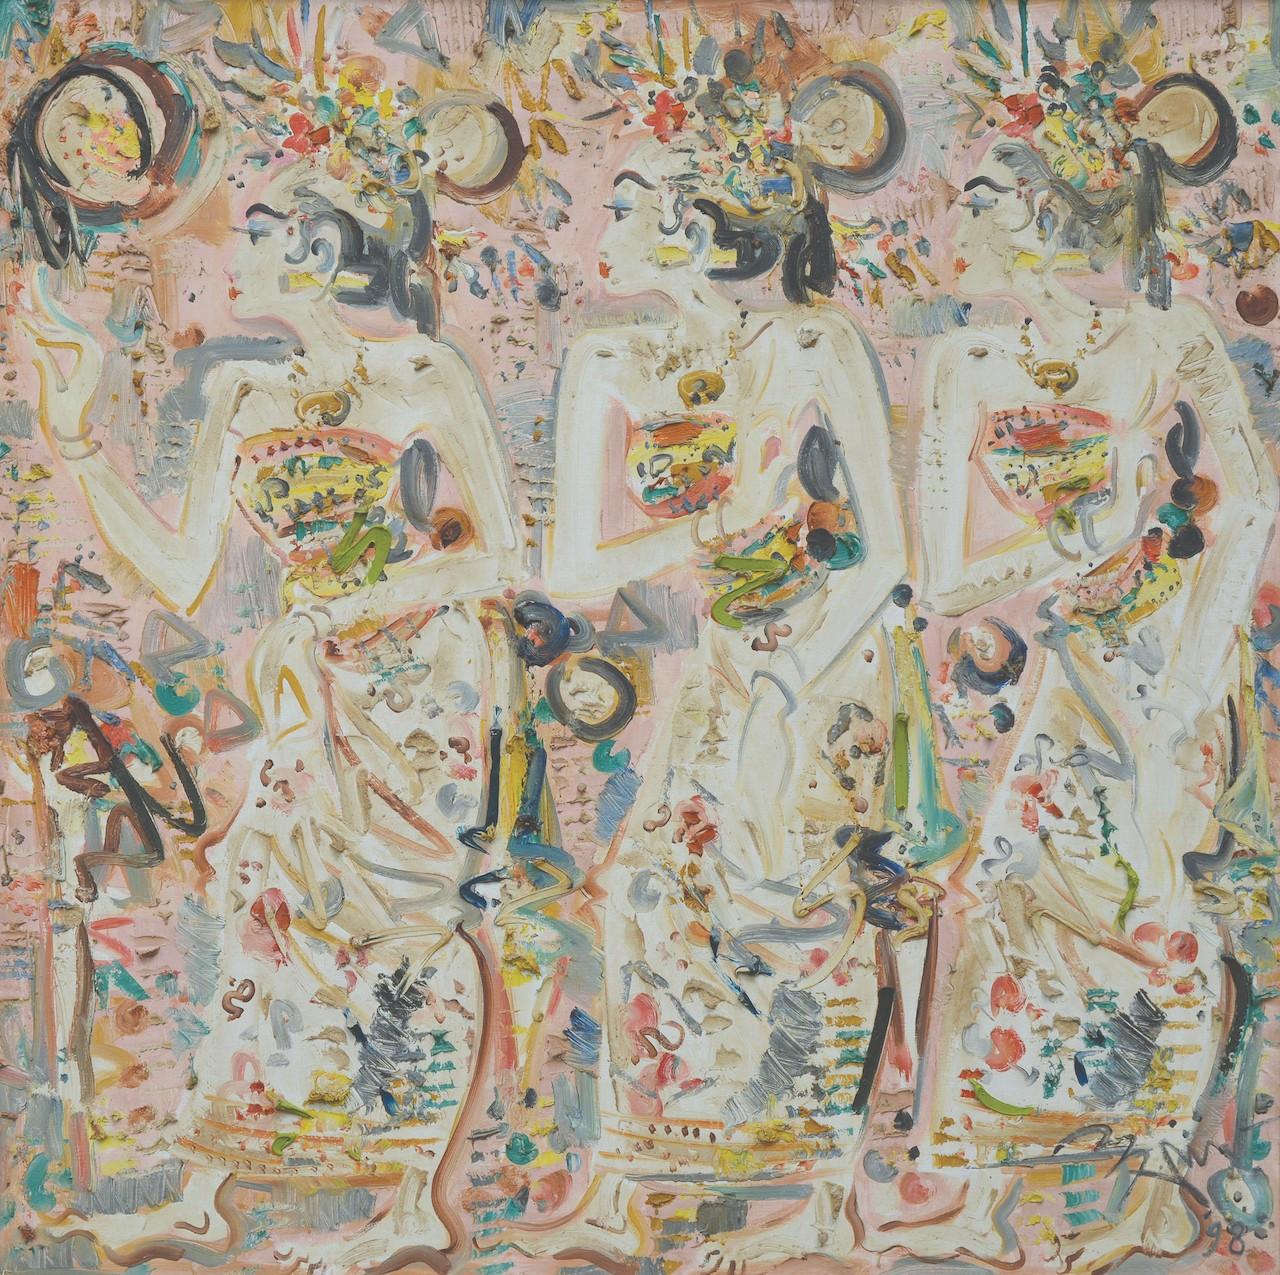 Lot 821 'Three Dancers' (1988) by Nyoman Gunarsa, oil on canvas, 145 x 145 cm